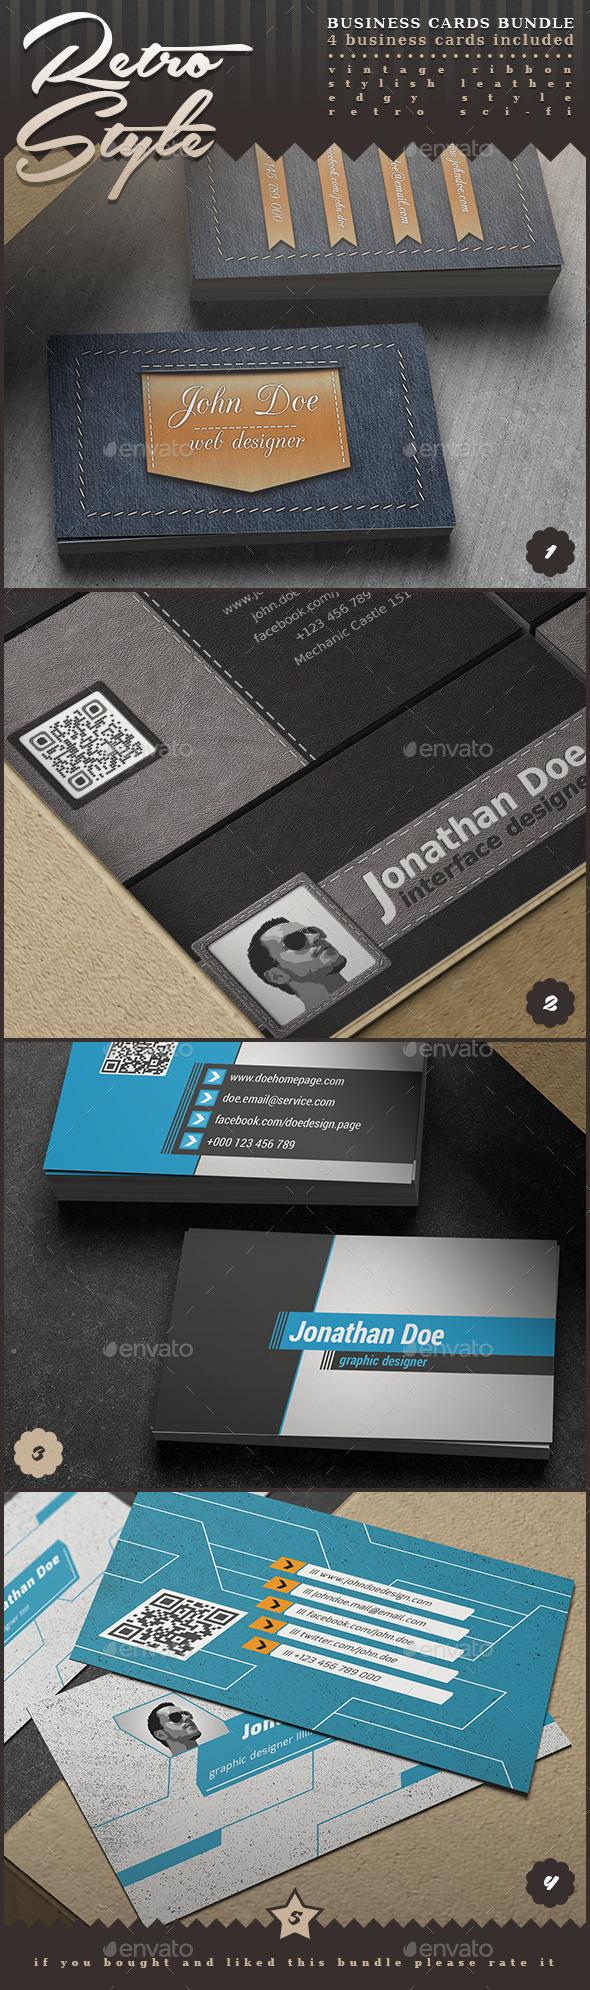 Retro Style Business Cards Bundle - Retro/Vintage Business Cards